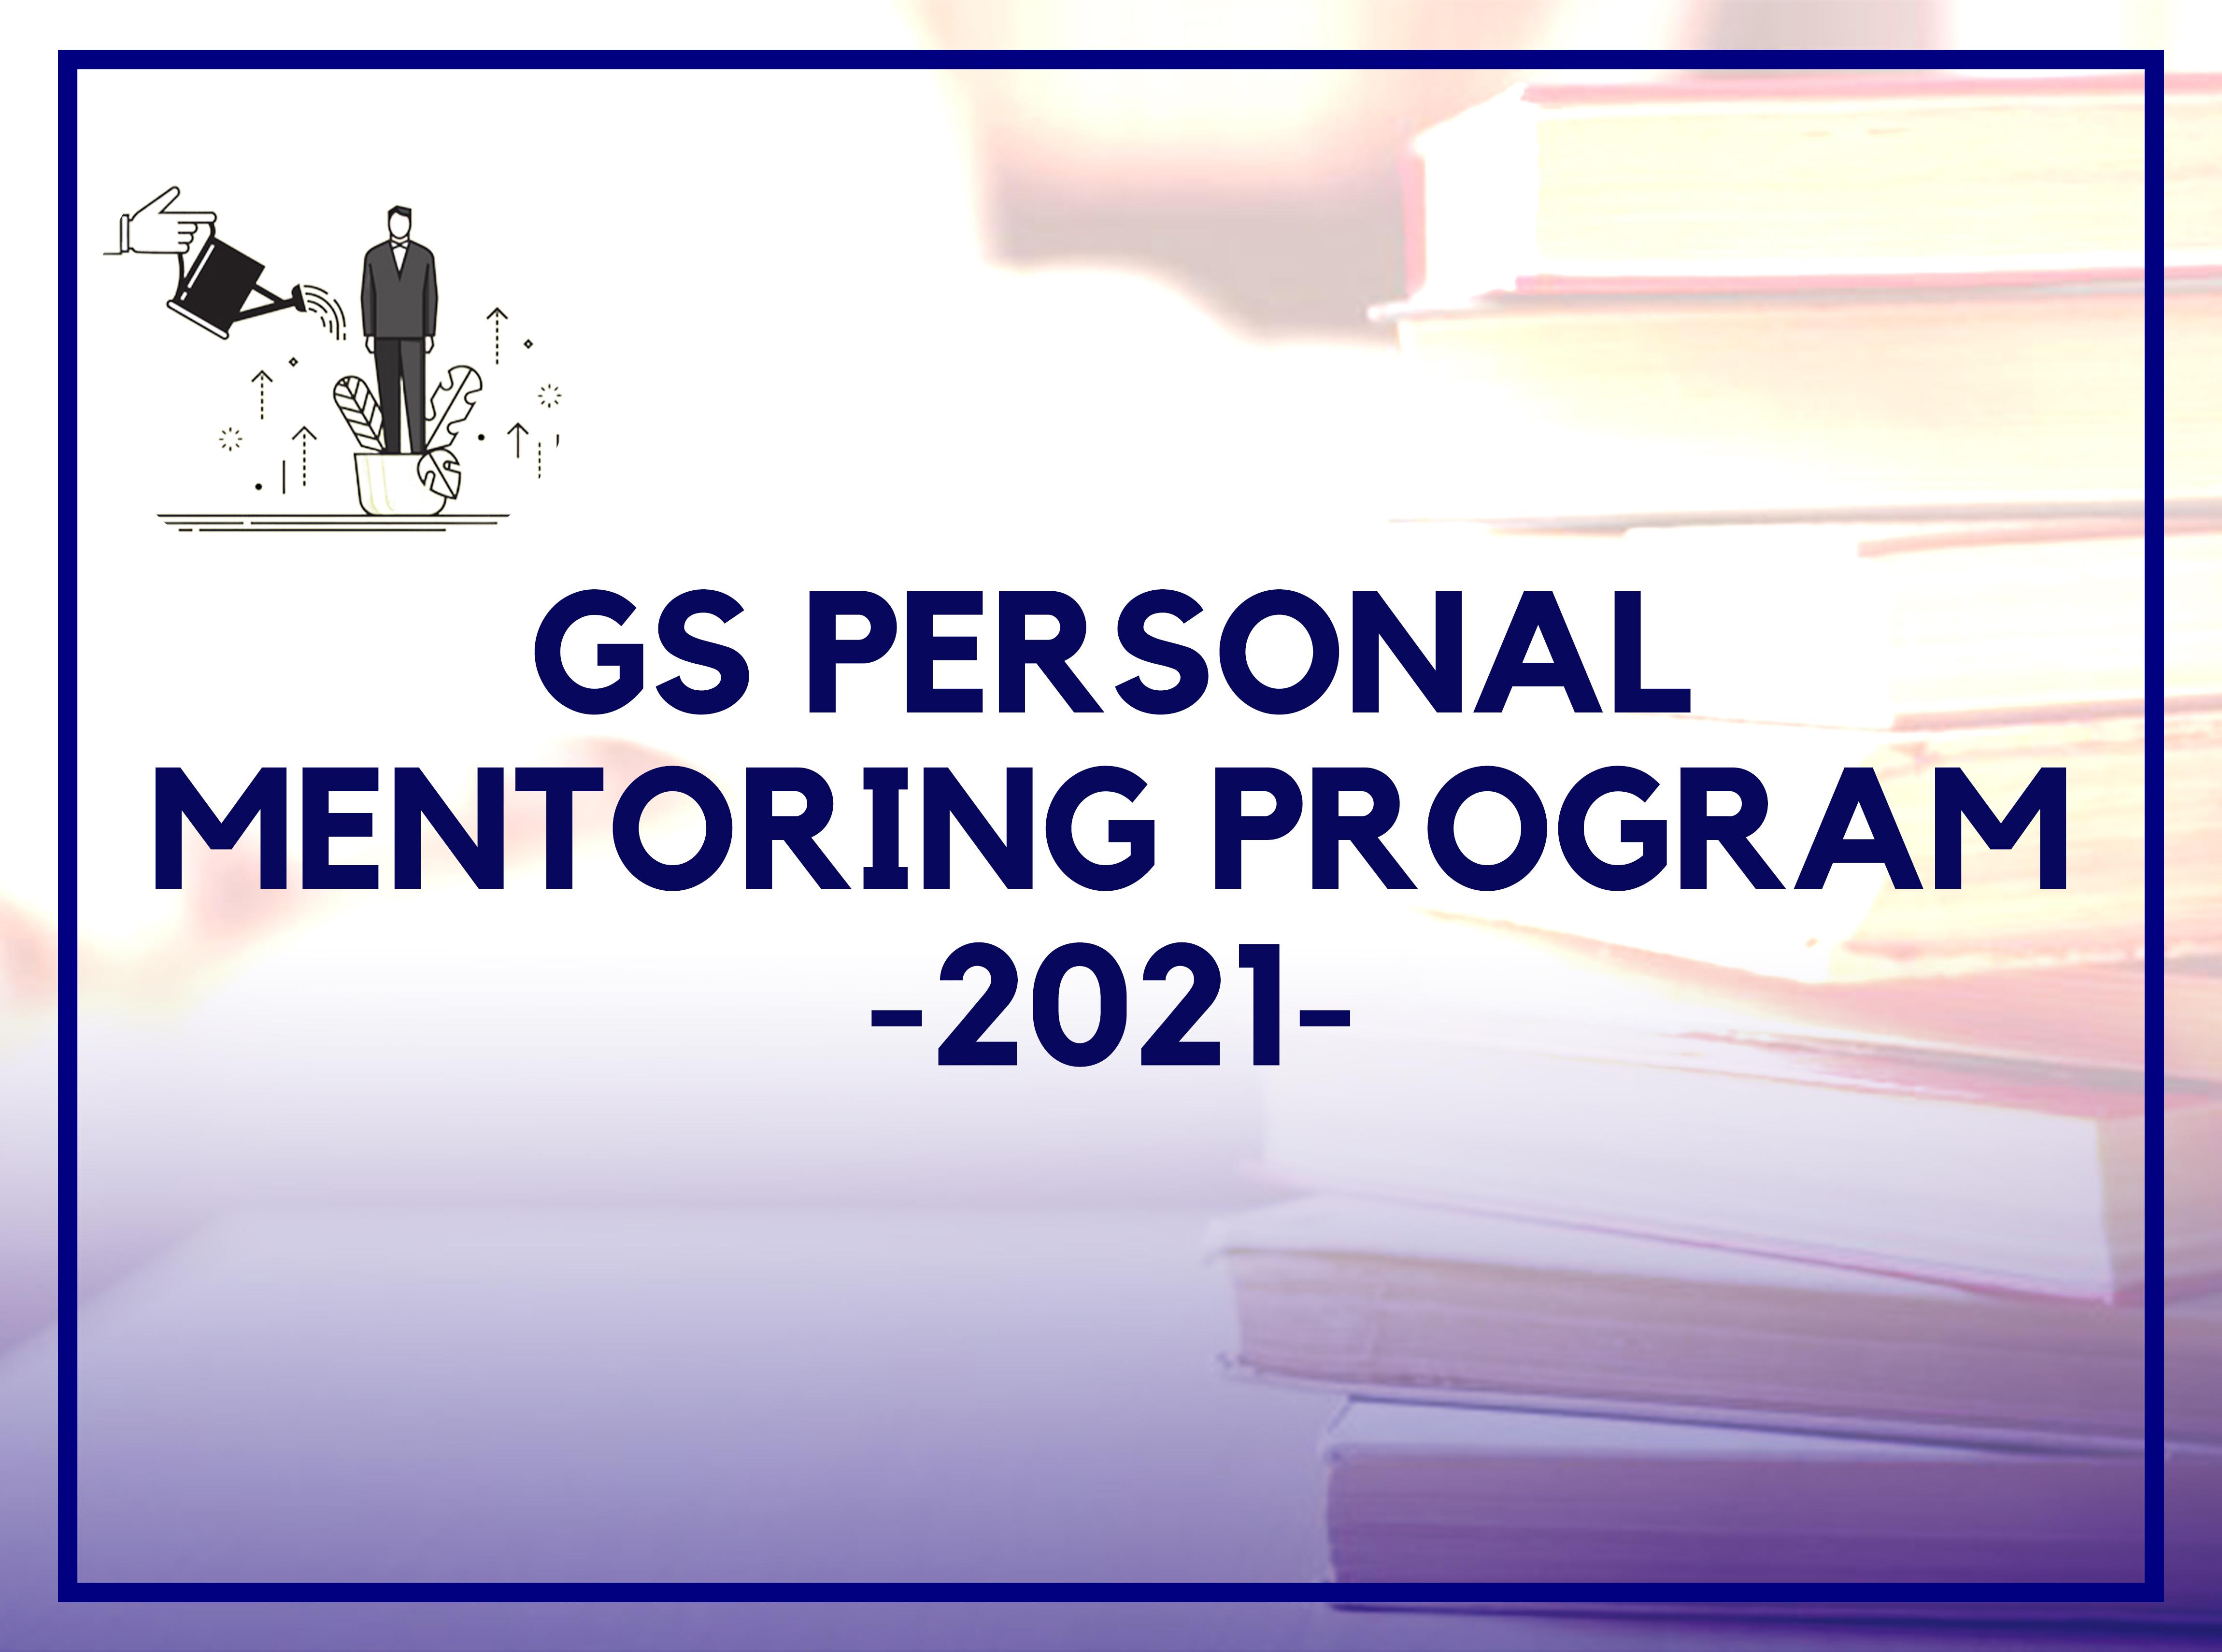 GS Personal Mentoring Program